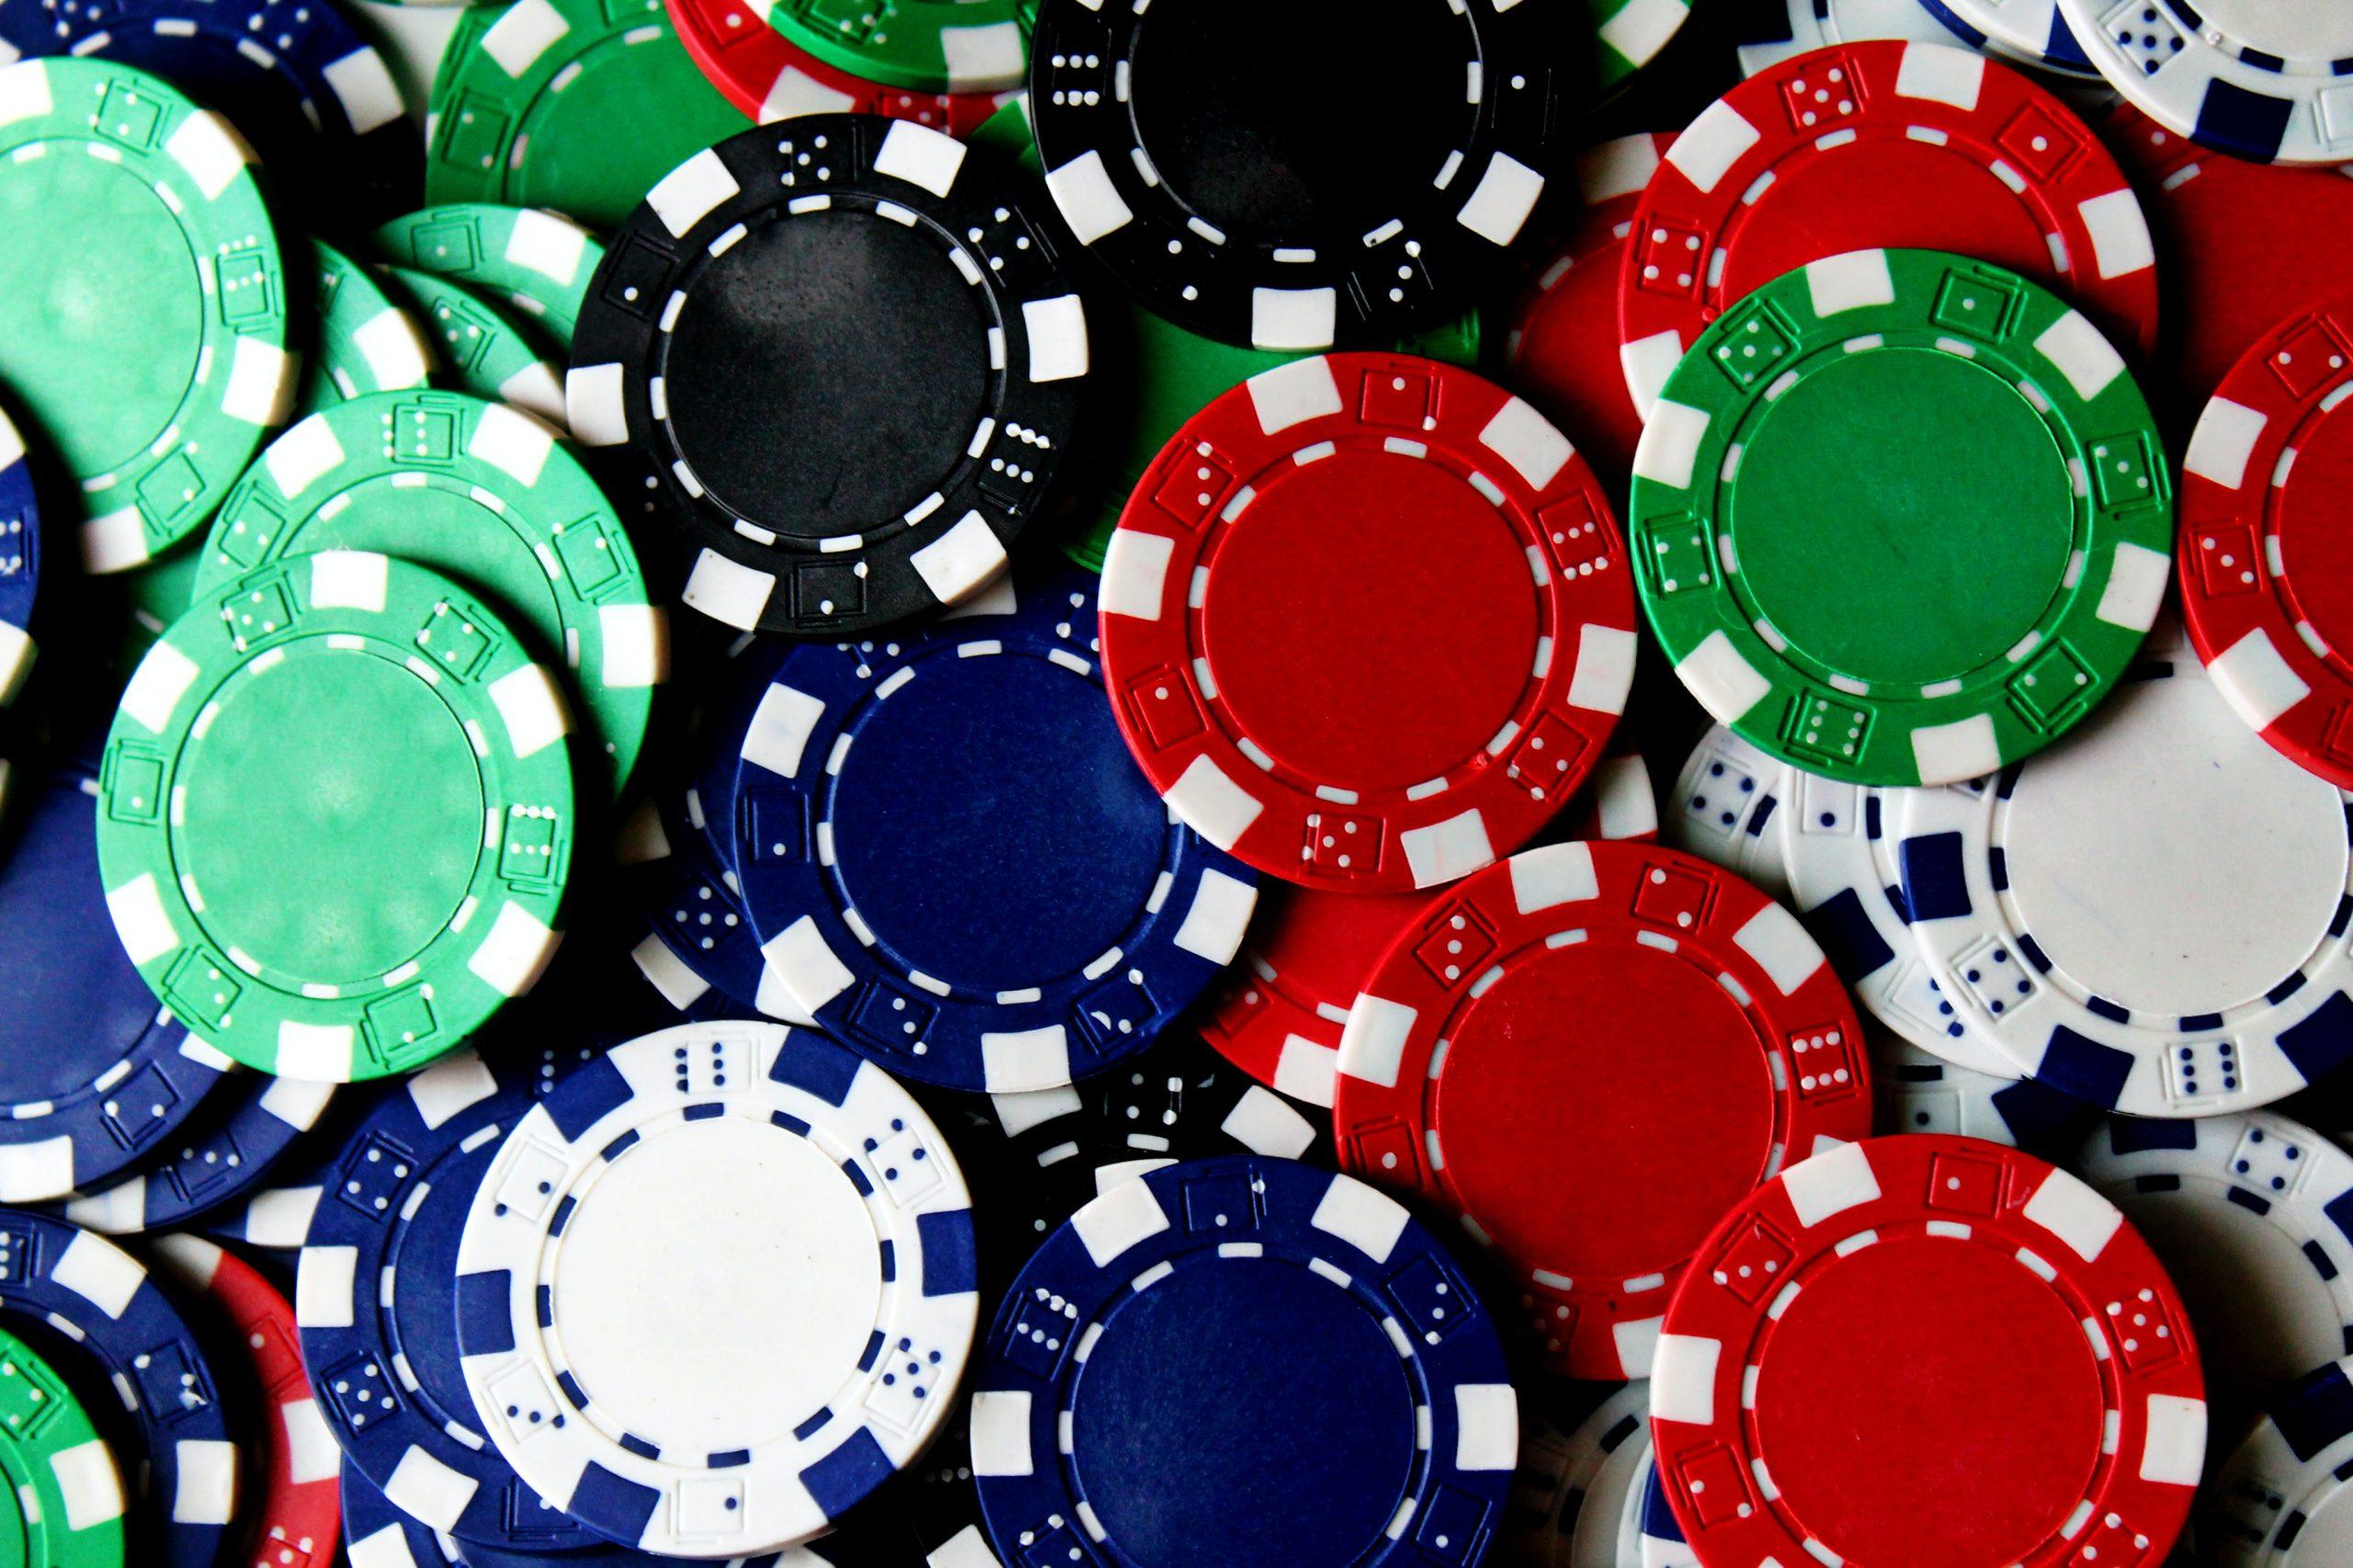 Ide Hadiah untuk Penggemar Poker pada tahun 2020